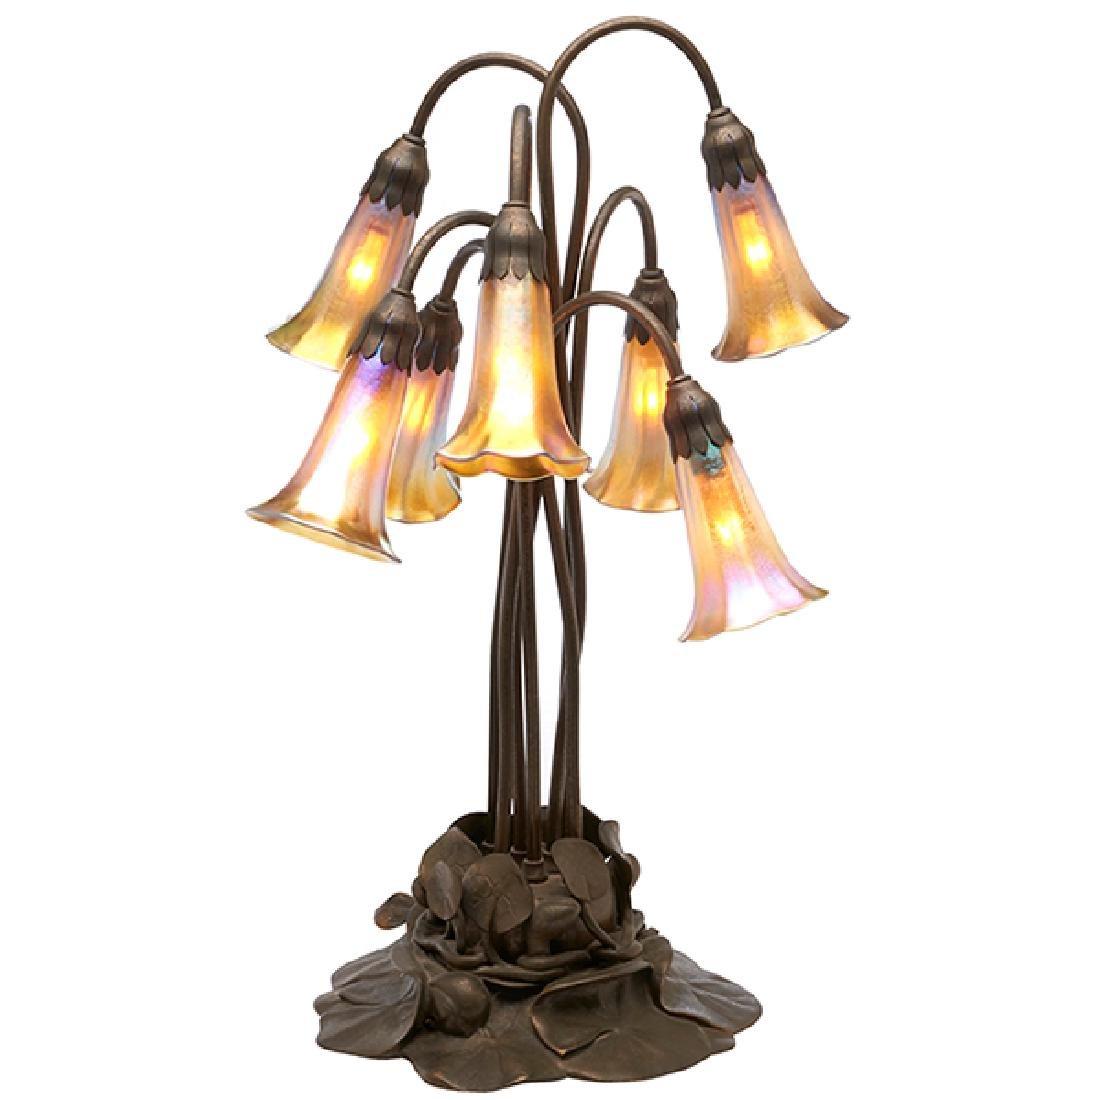 Tiffany Studios, seven-light Lily table lamp, #385, New